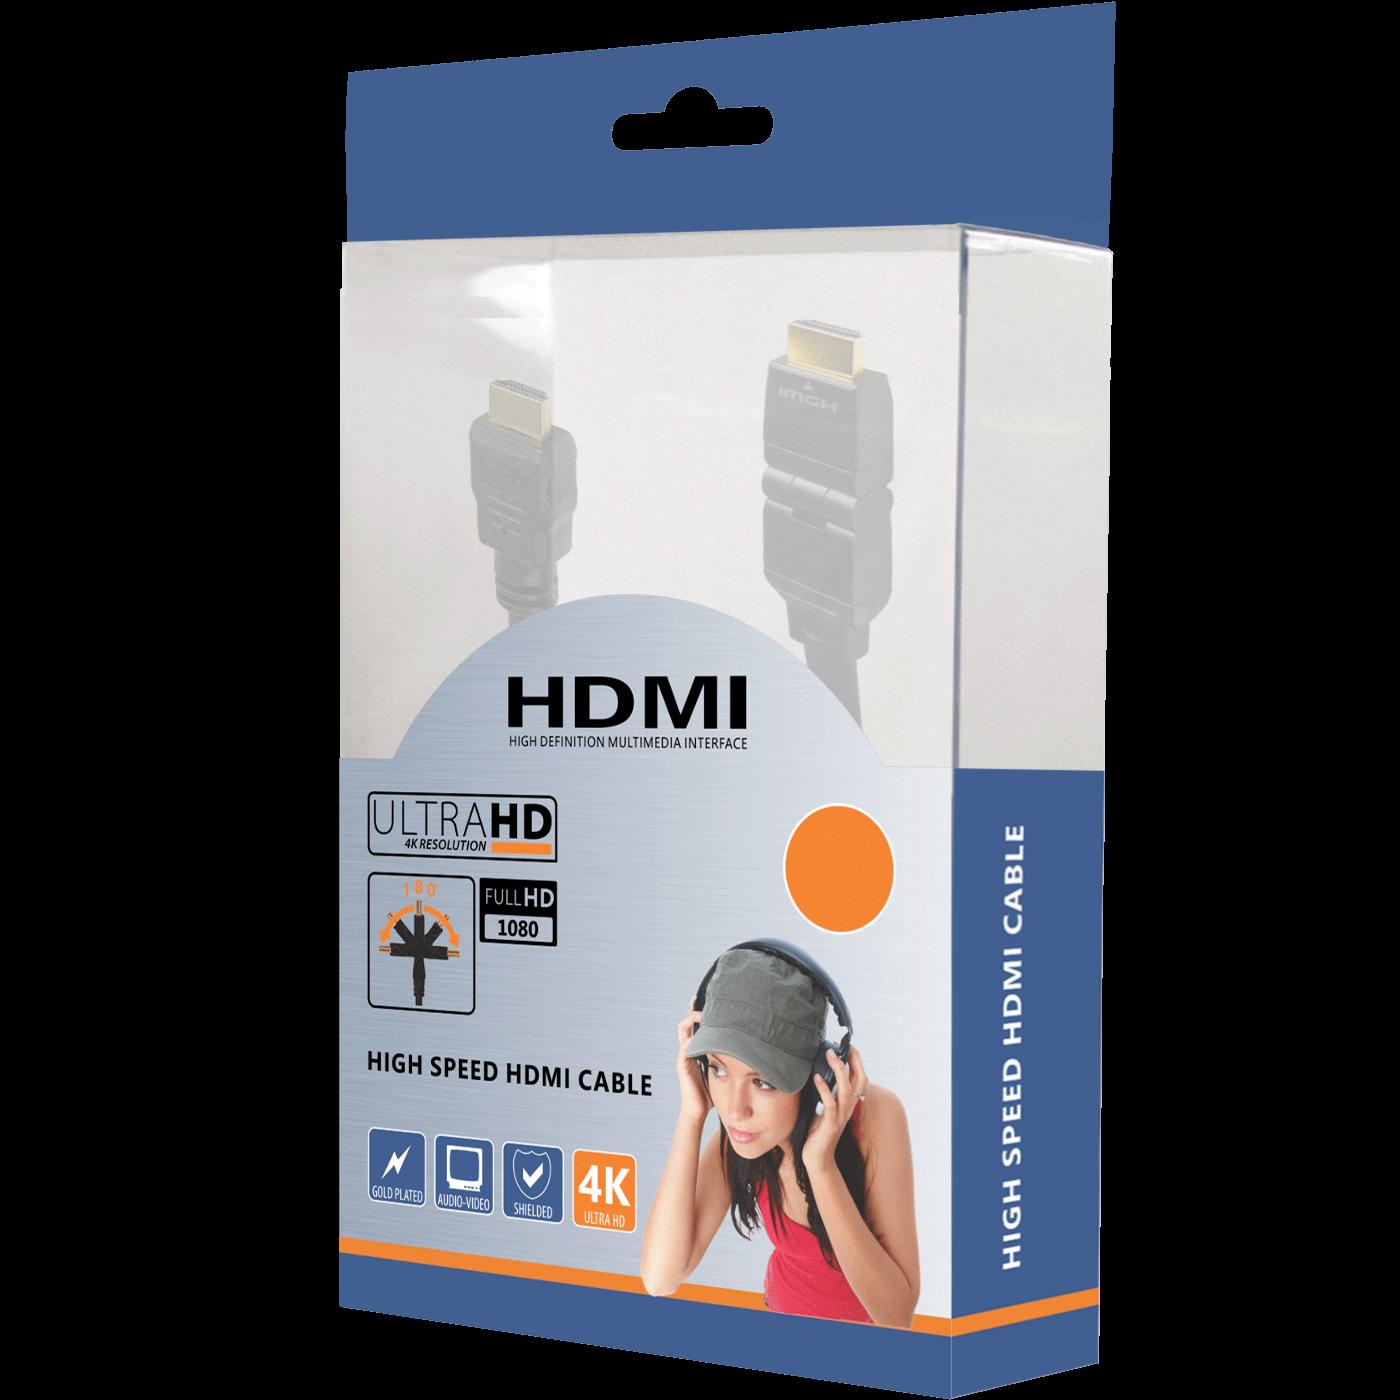 HDMI kabl, 5.0 met, ver. 1.4, 4K, 3D, HEC, HDCP, ARC